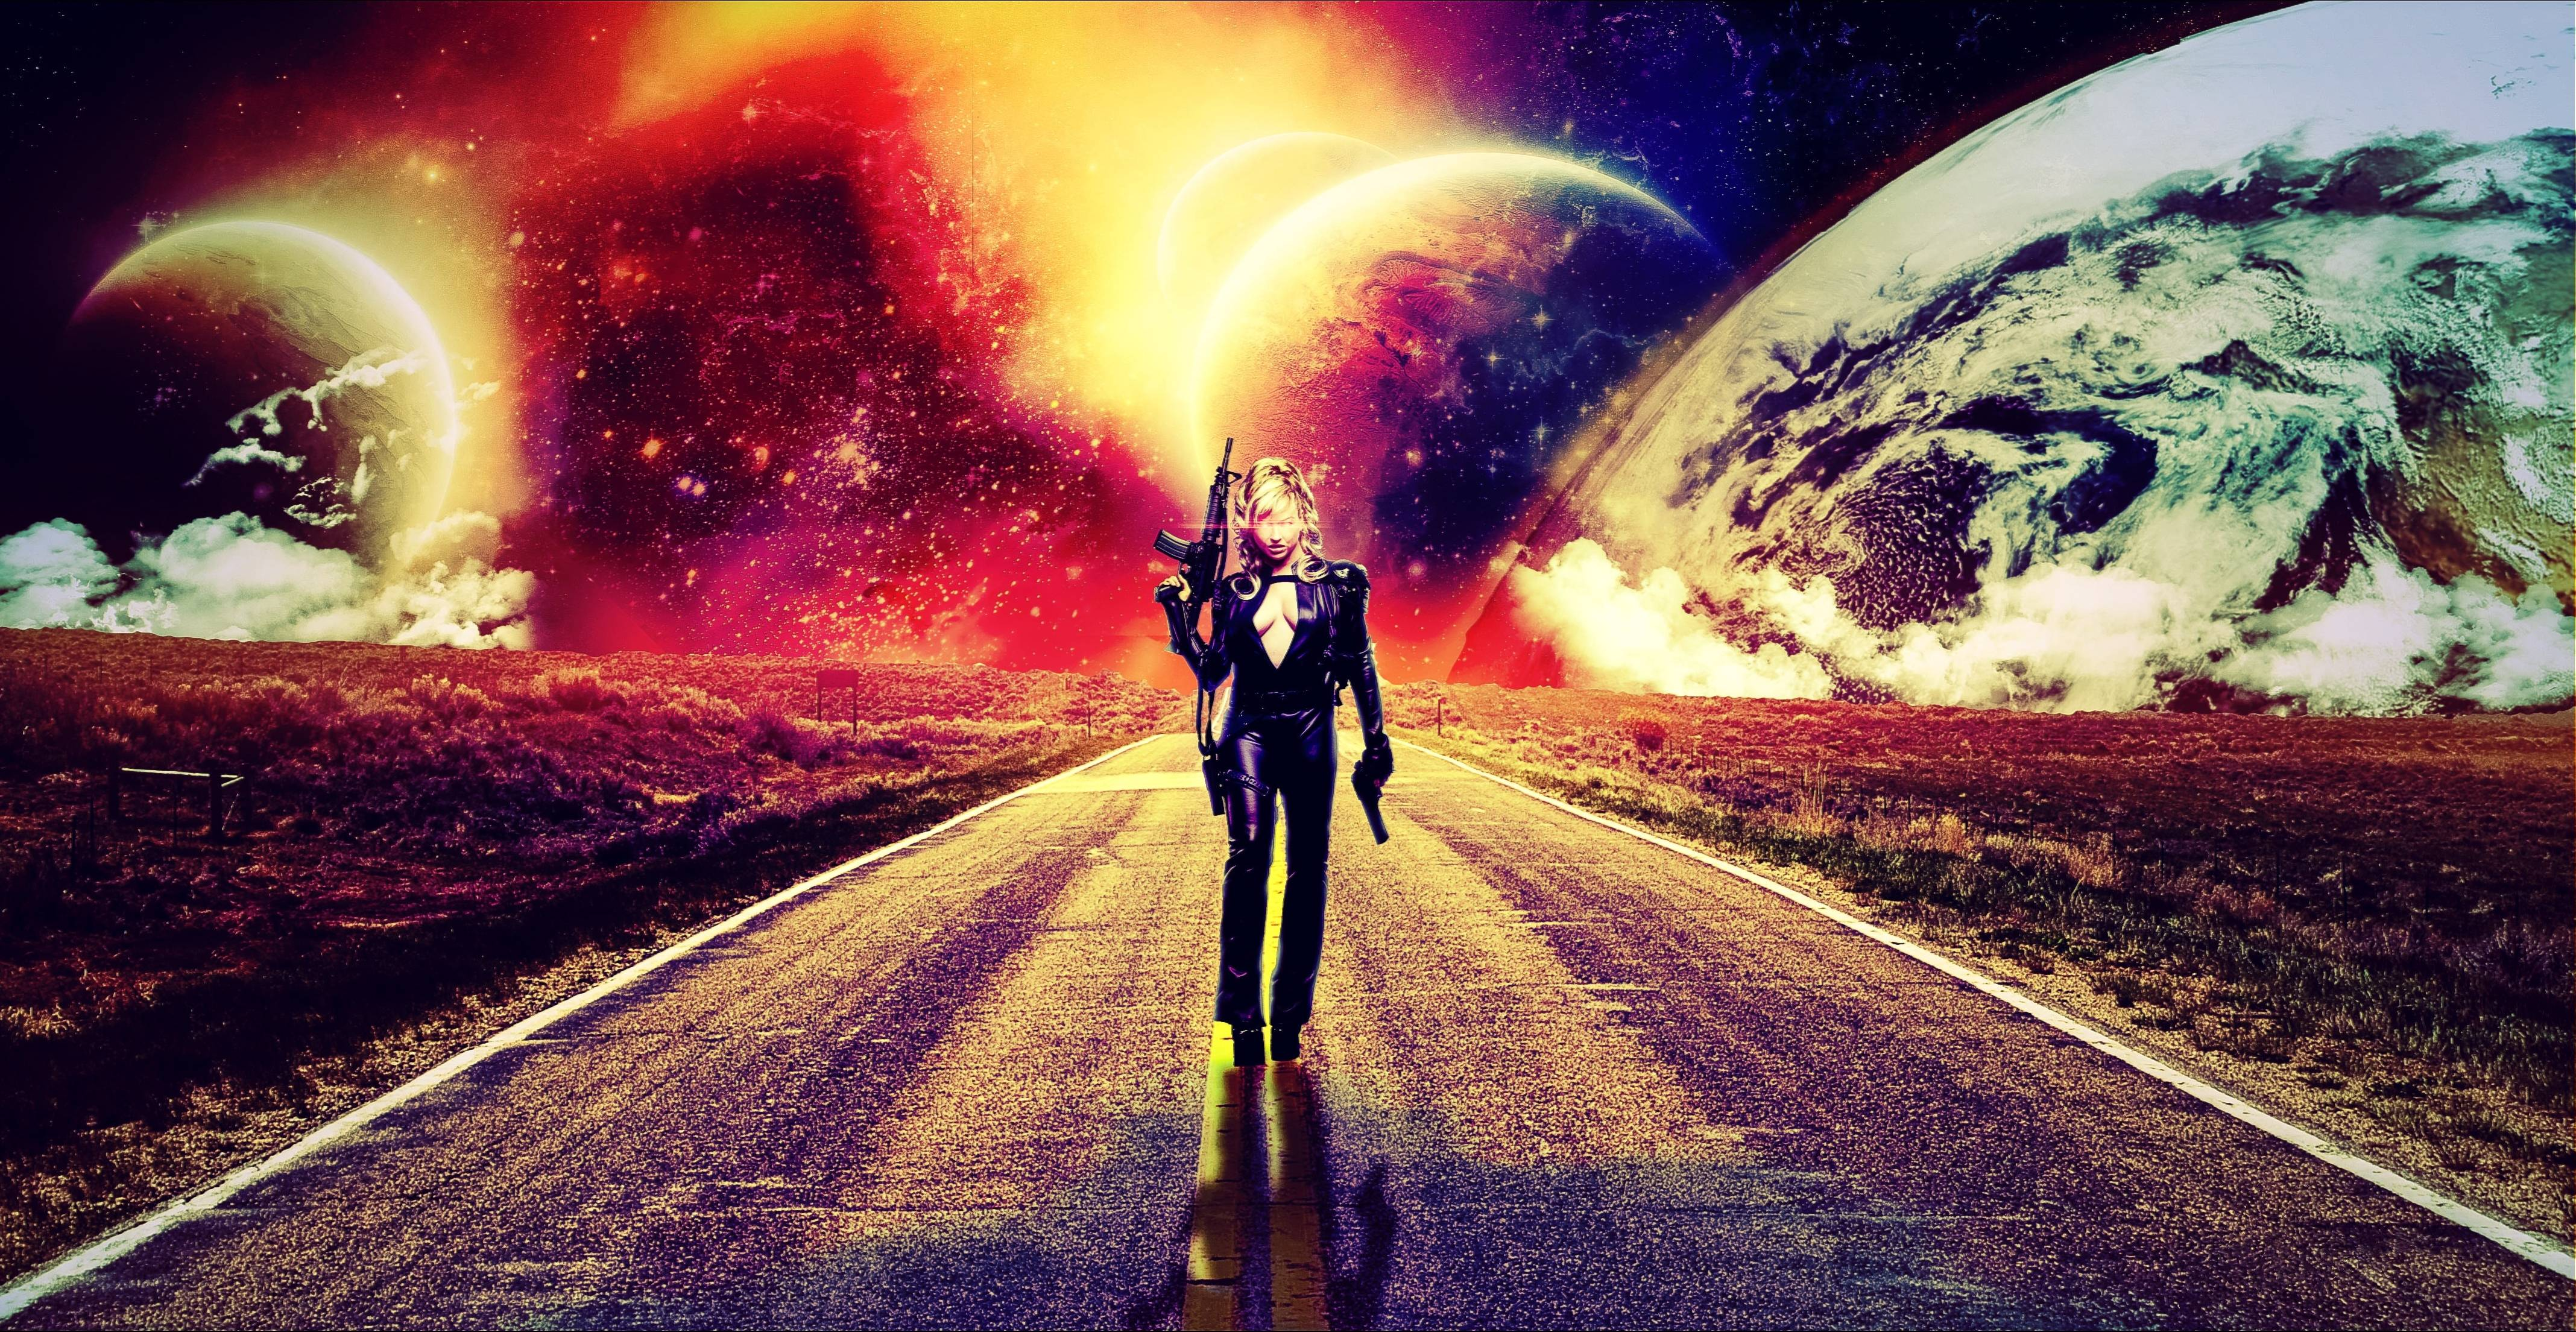 дорога, девушка, планеты